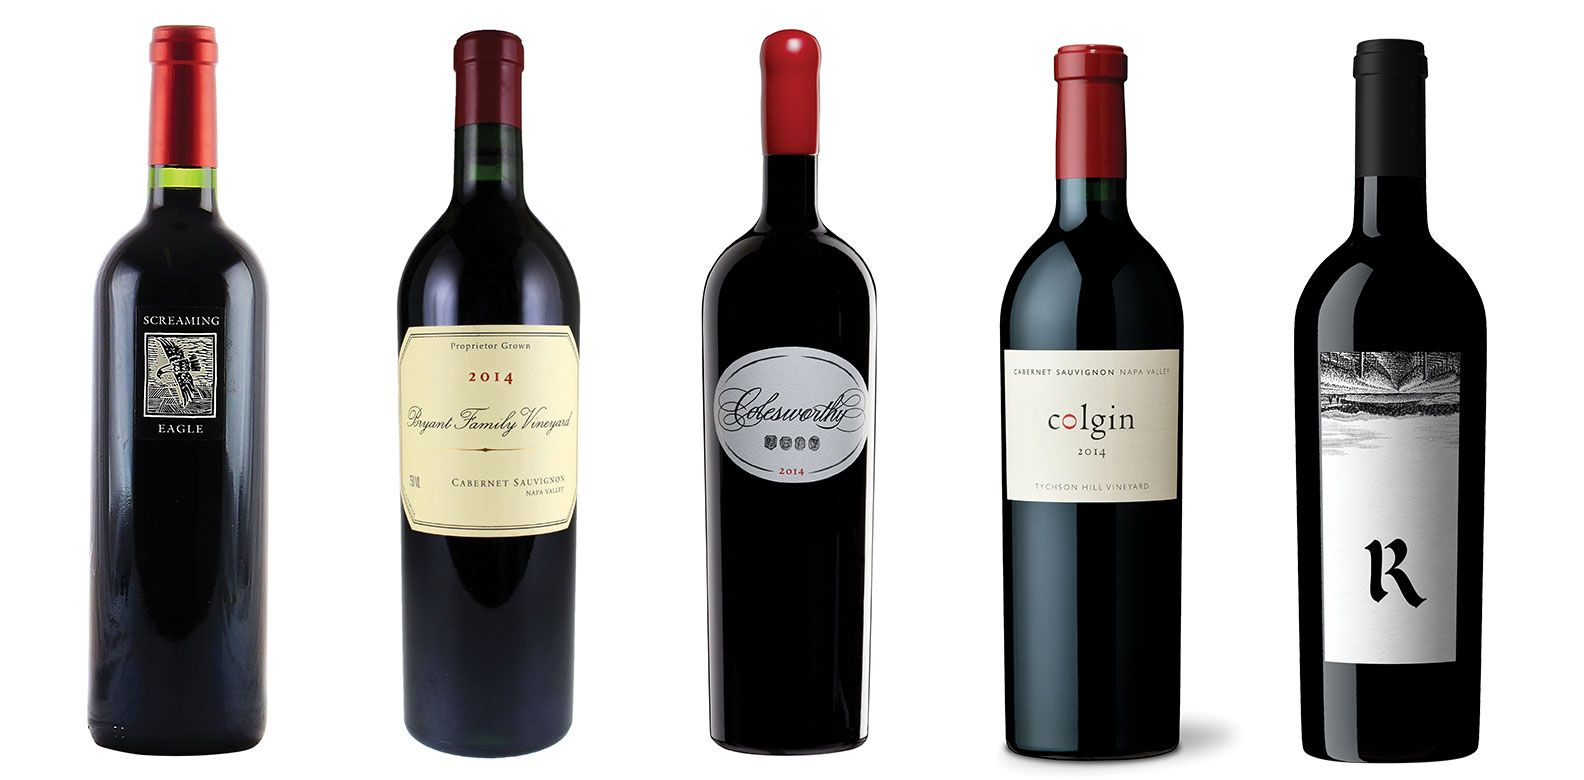 Top 10 Napa And Sonoma Wines, According To James Suckling